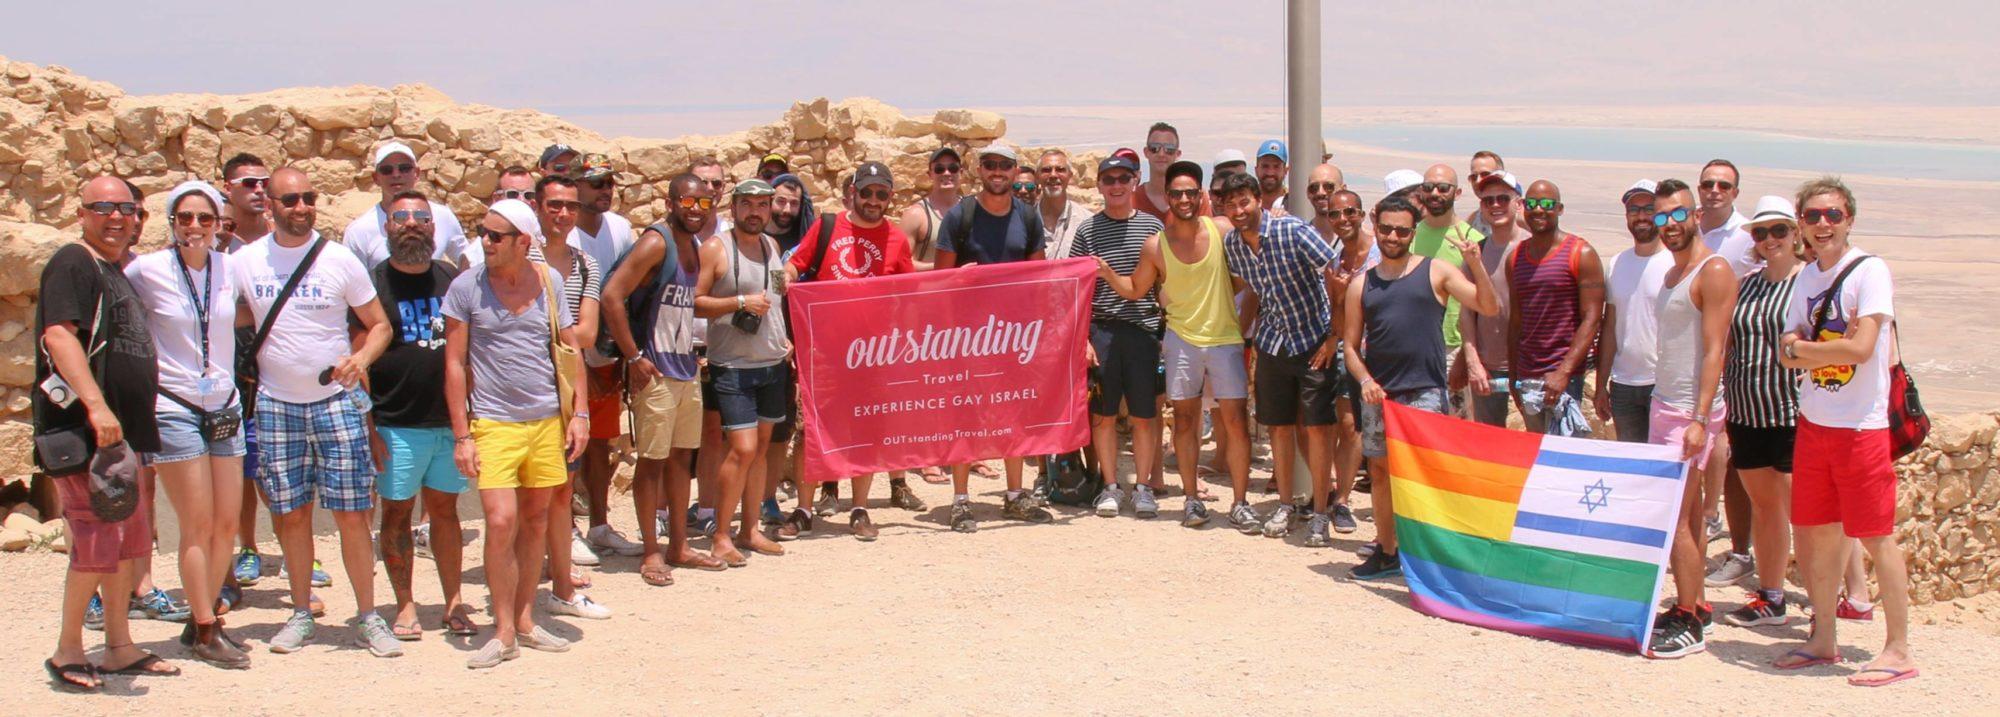 OUTstanding Travel Israel